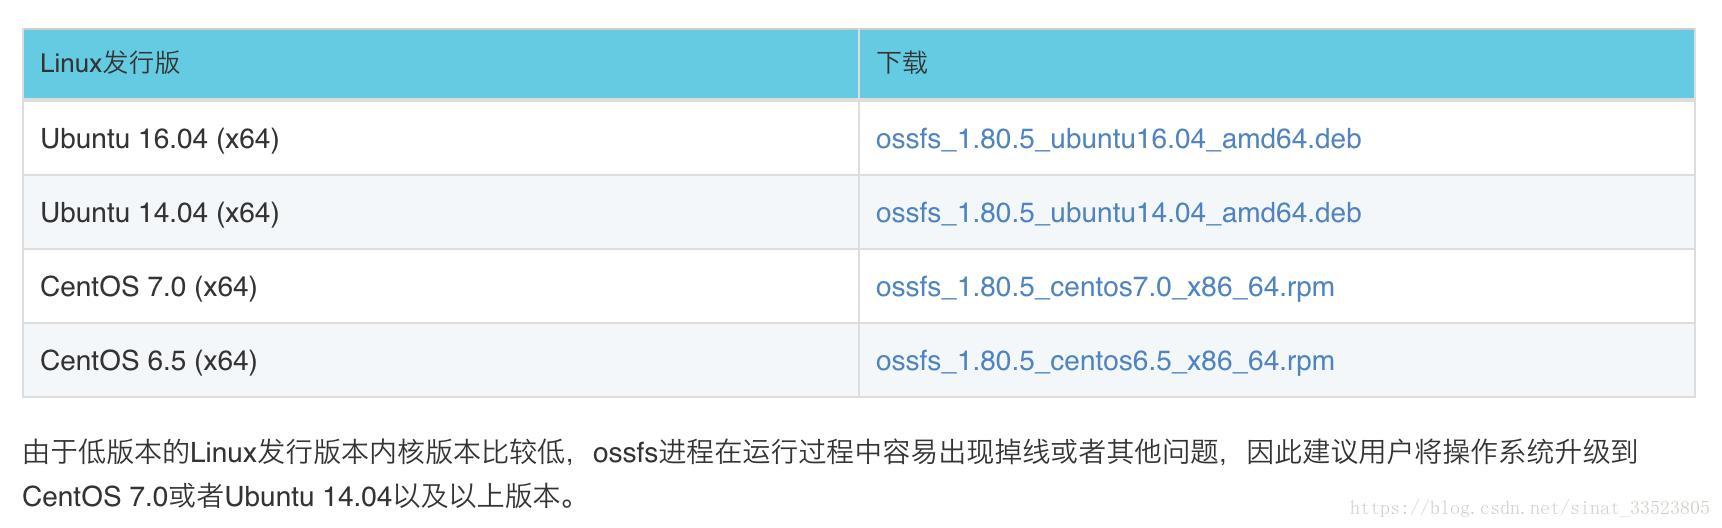 Alibaba Cloud] ECS uses Ossfs to mount OSS storage